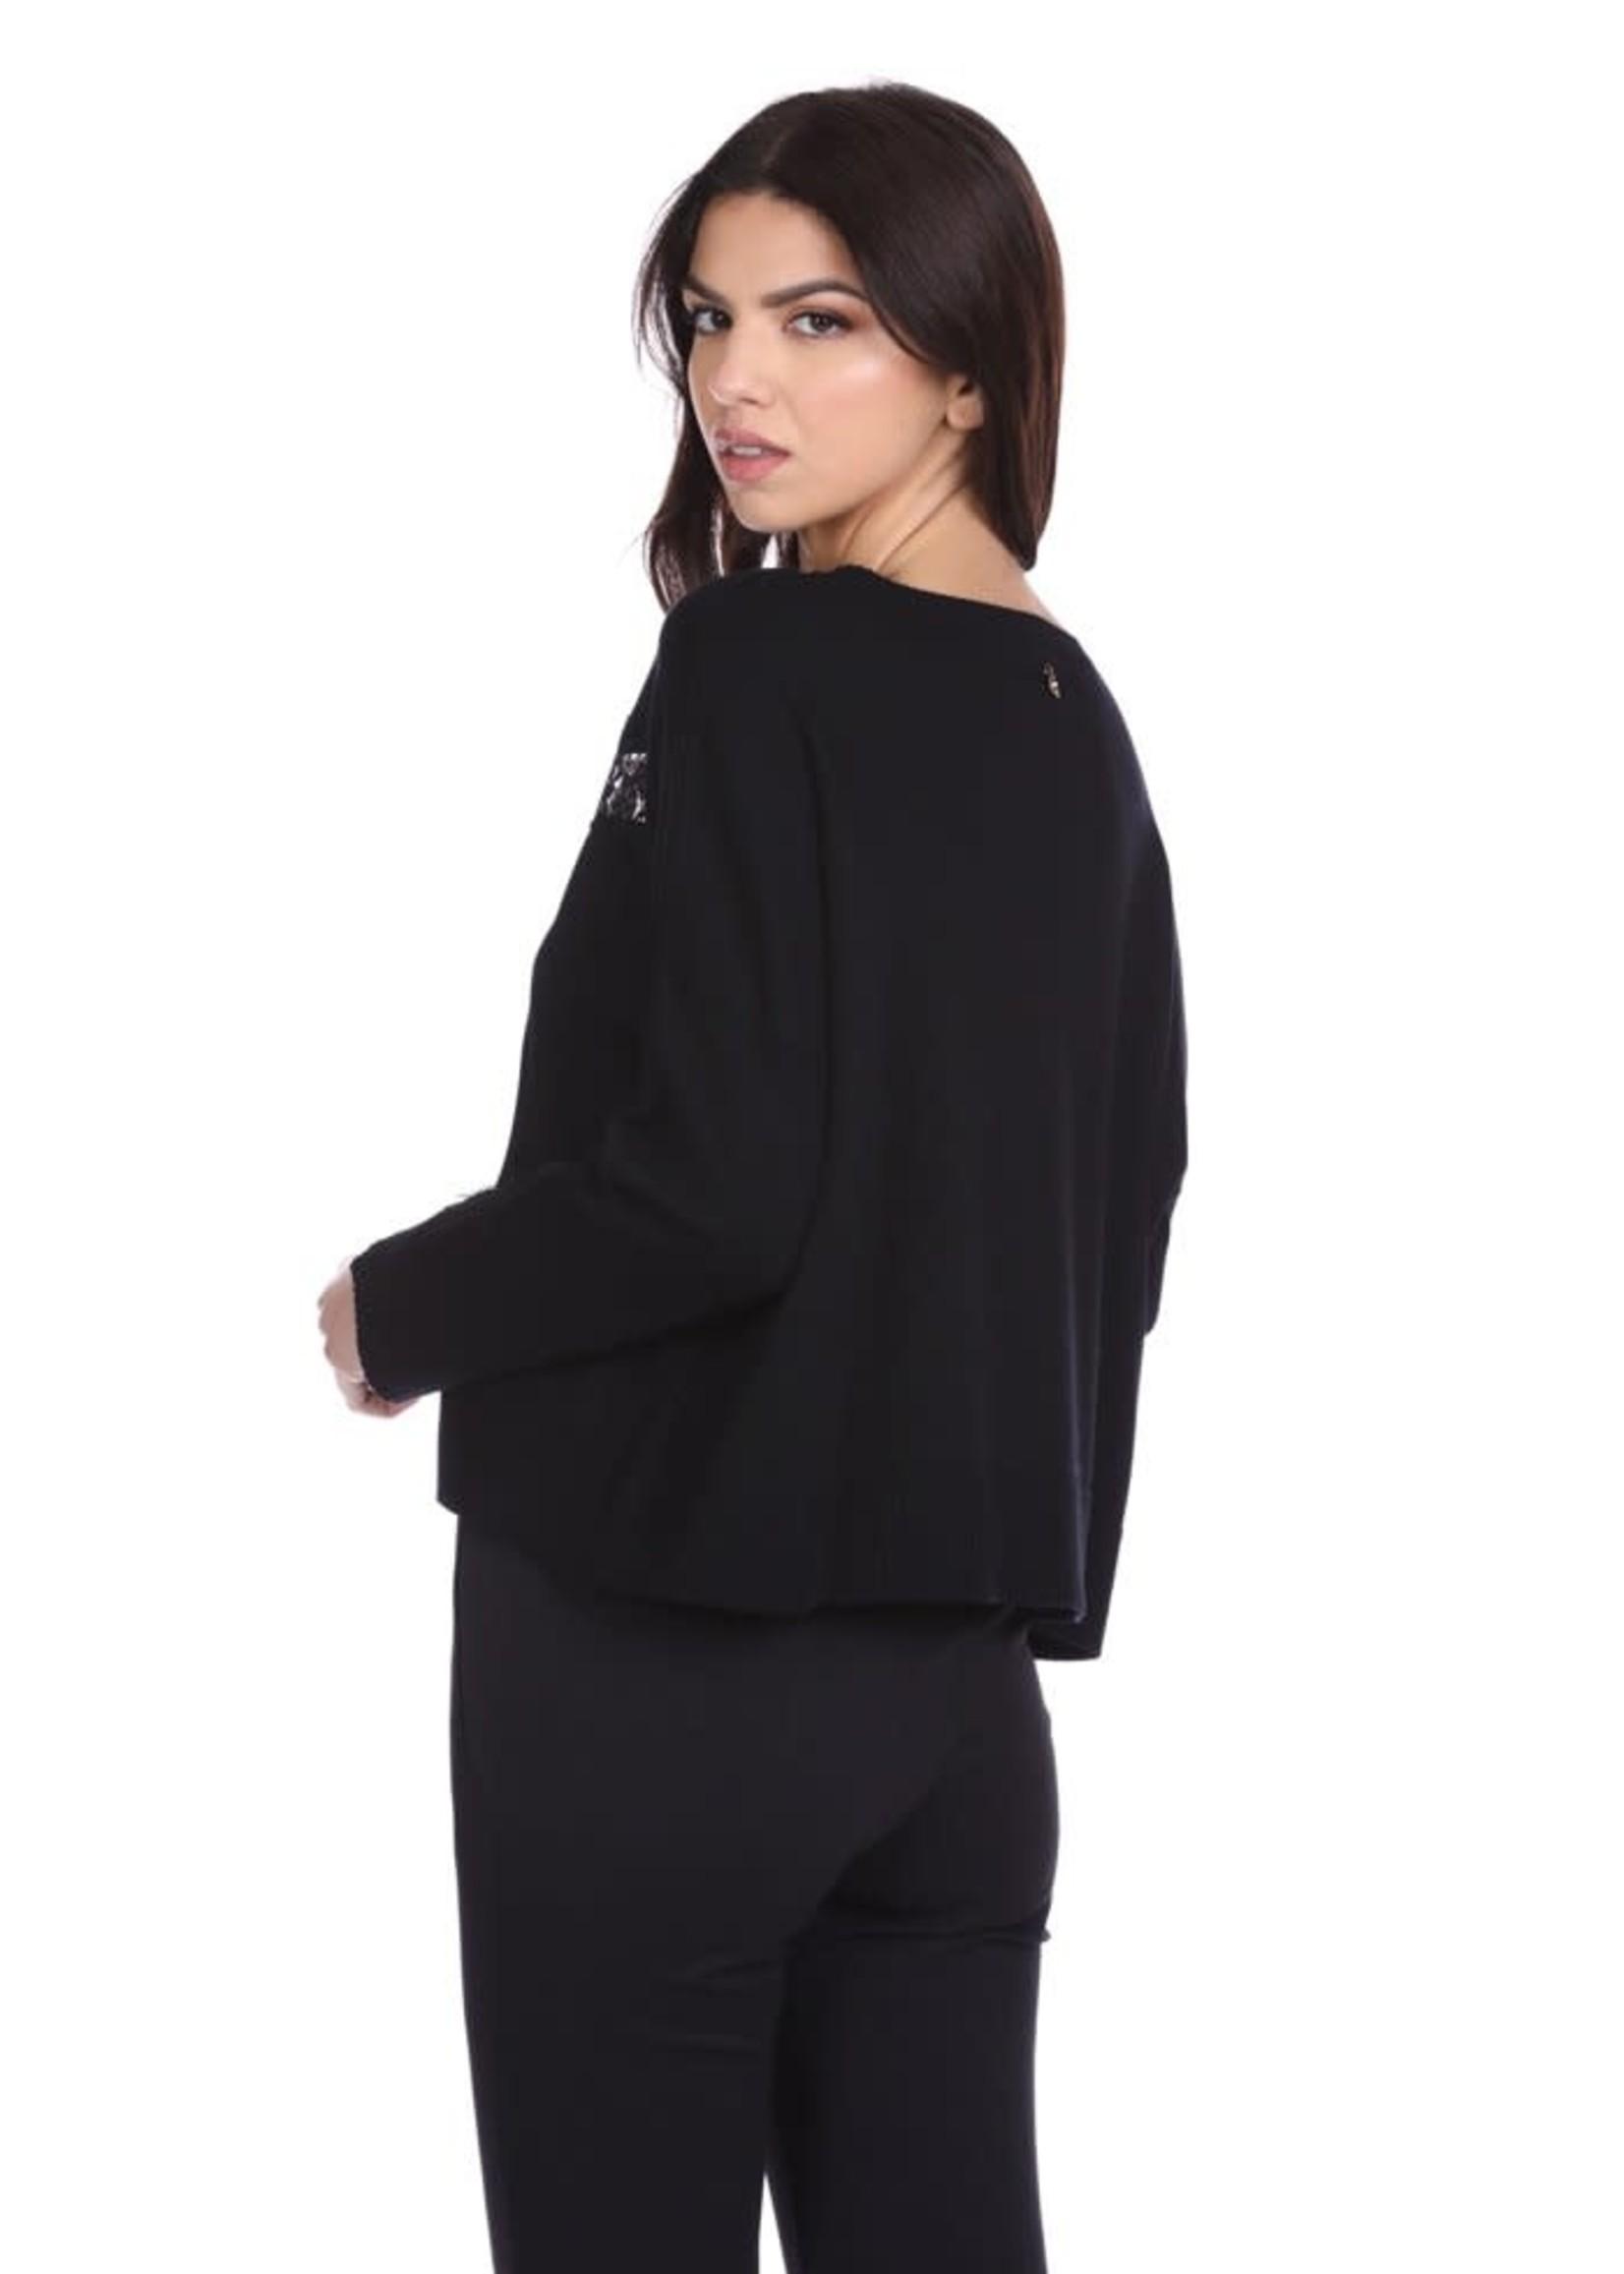 Relish COPYLSER korte longsleeve shirt met kanten details